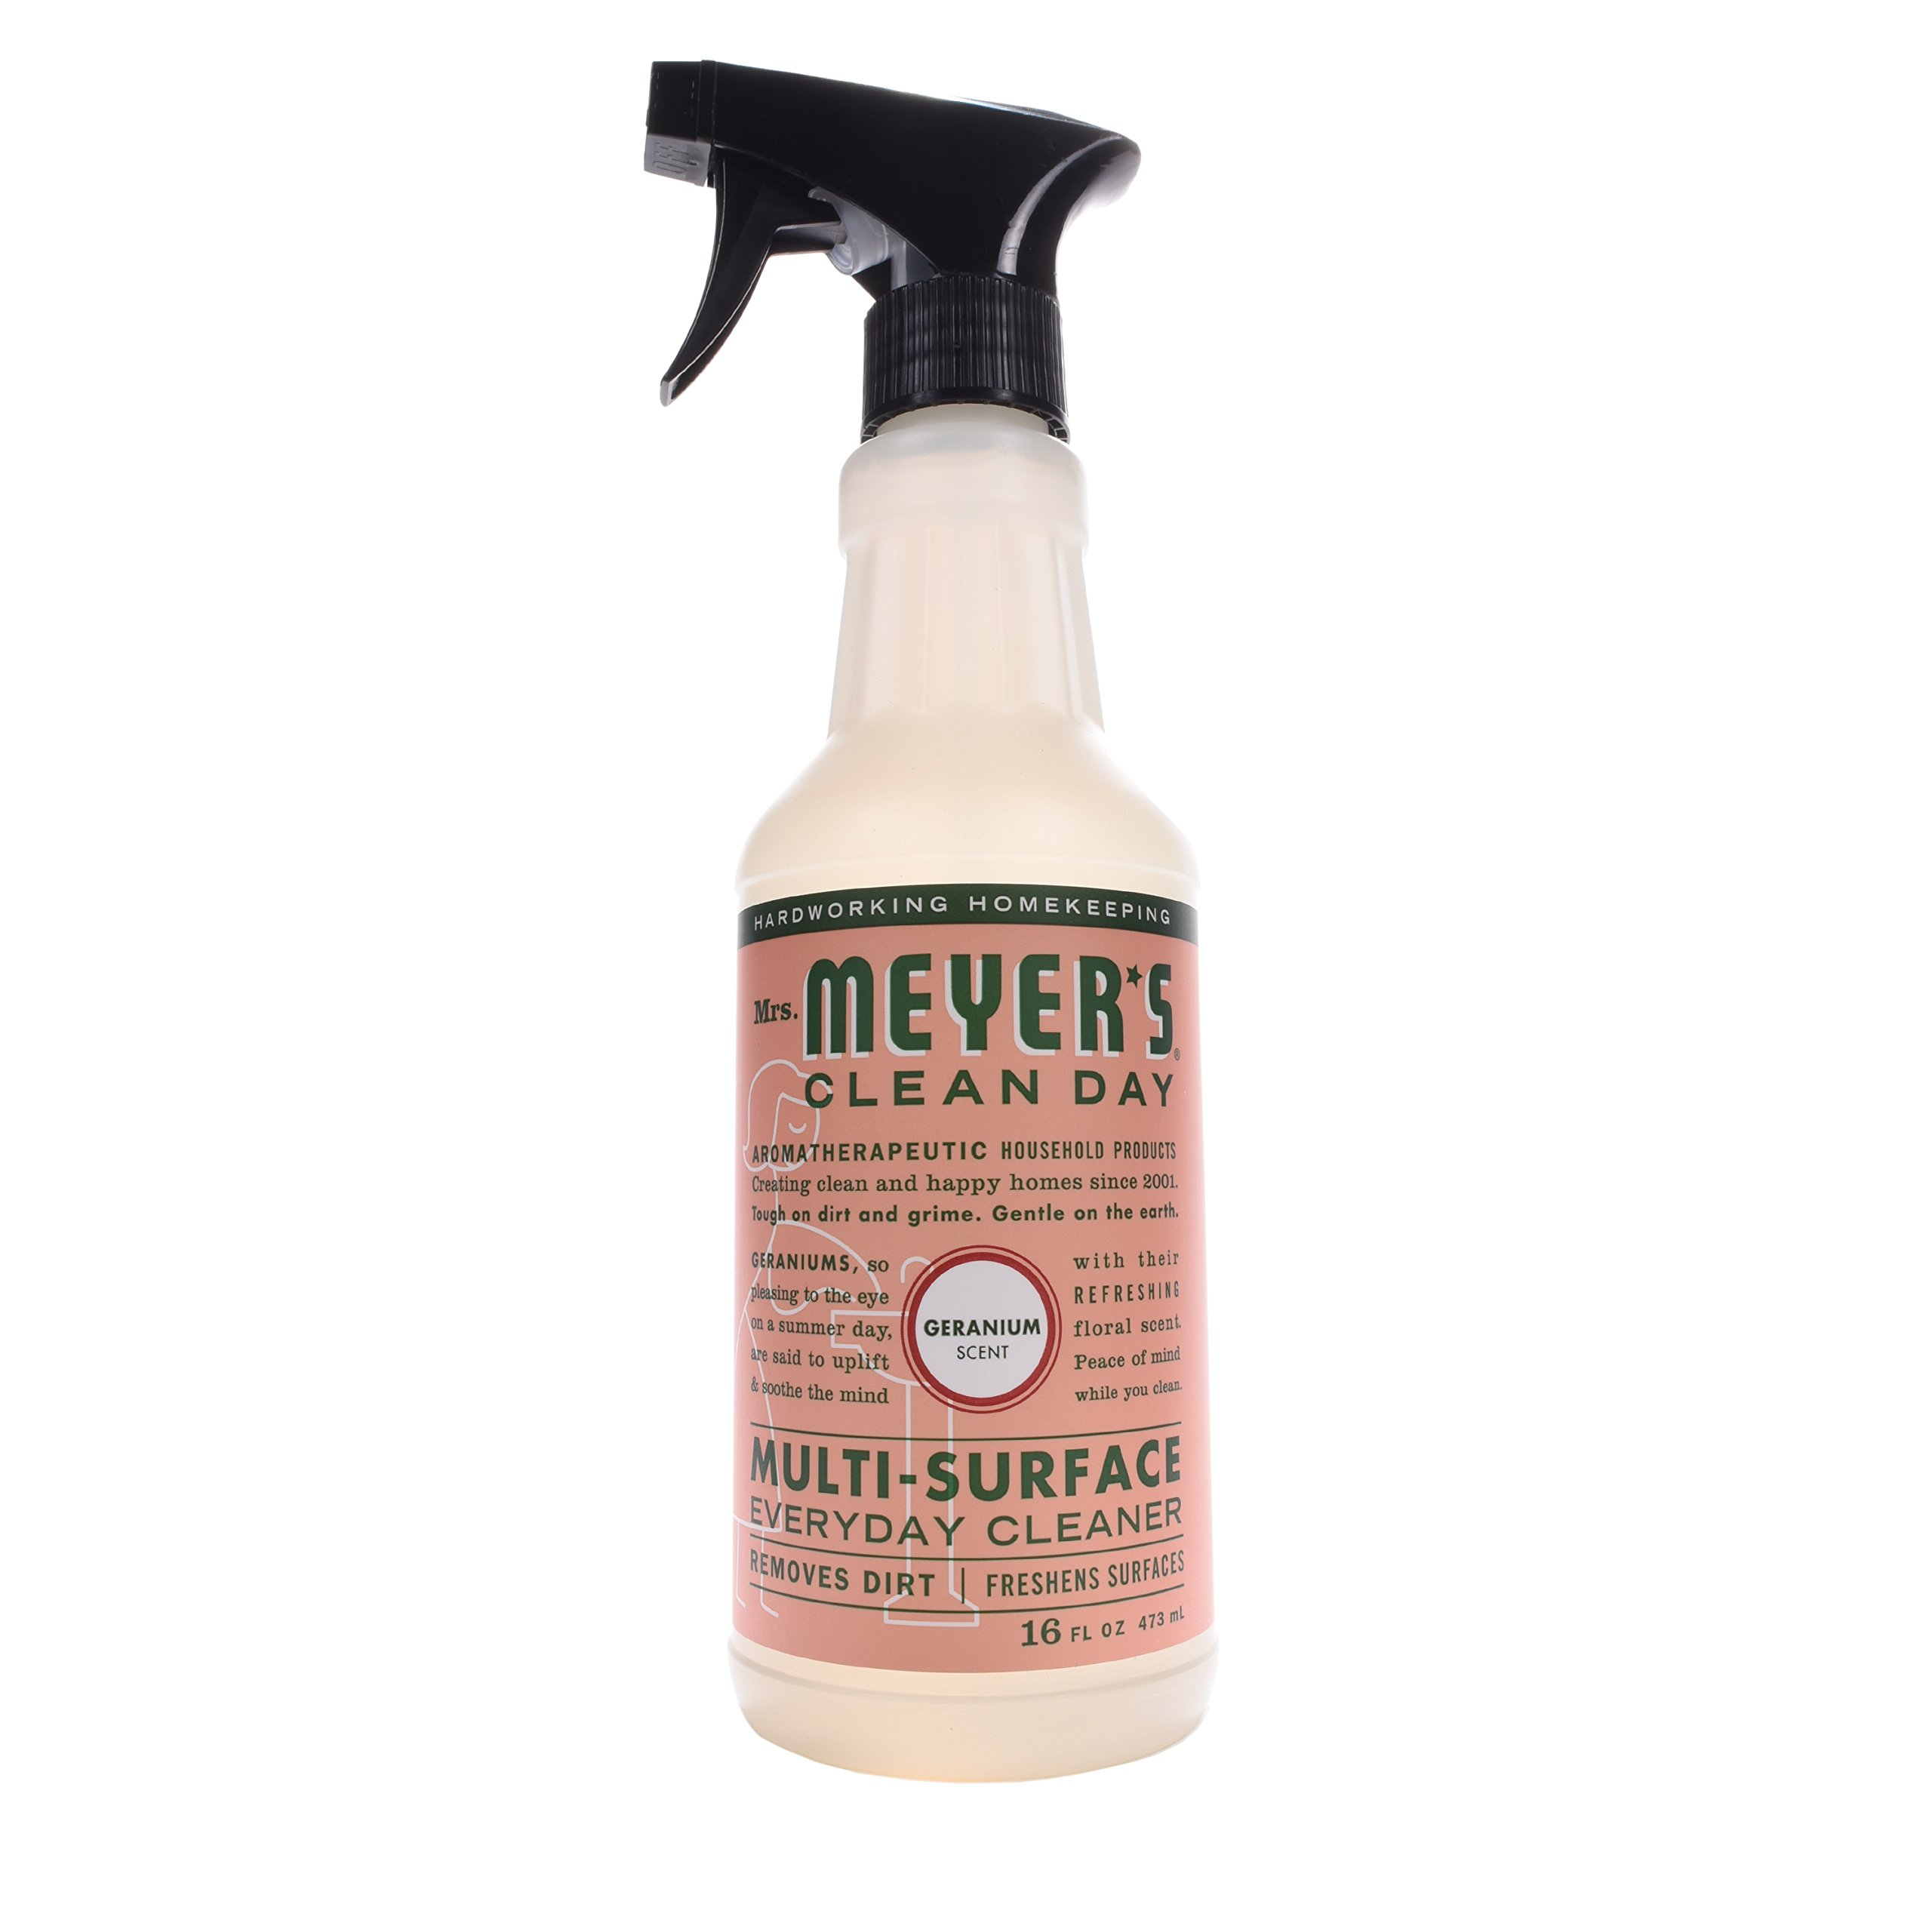 Mrs. Meyer's Clean Day Multi-Surface Everyday Cleaner, Geranium, 16 fl oz